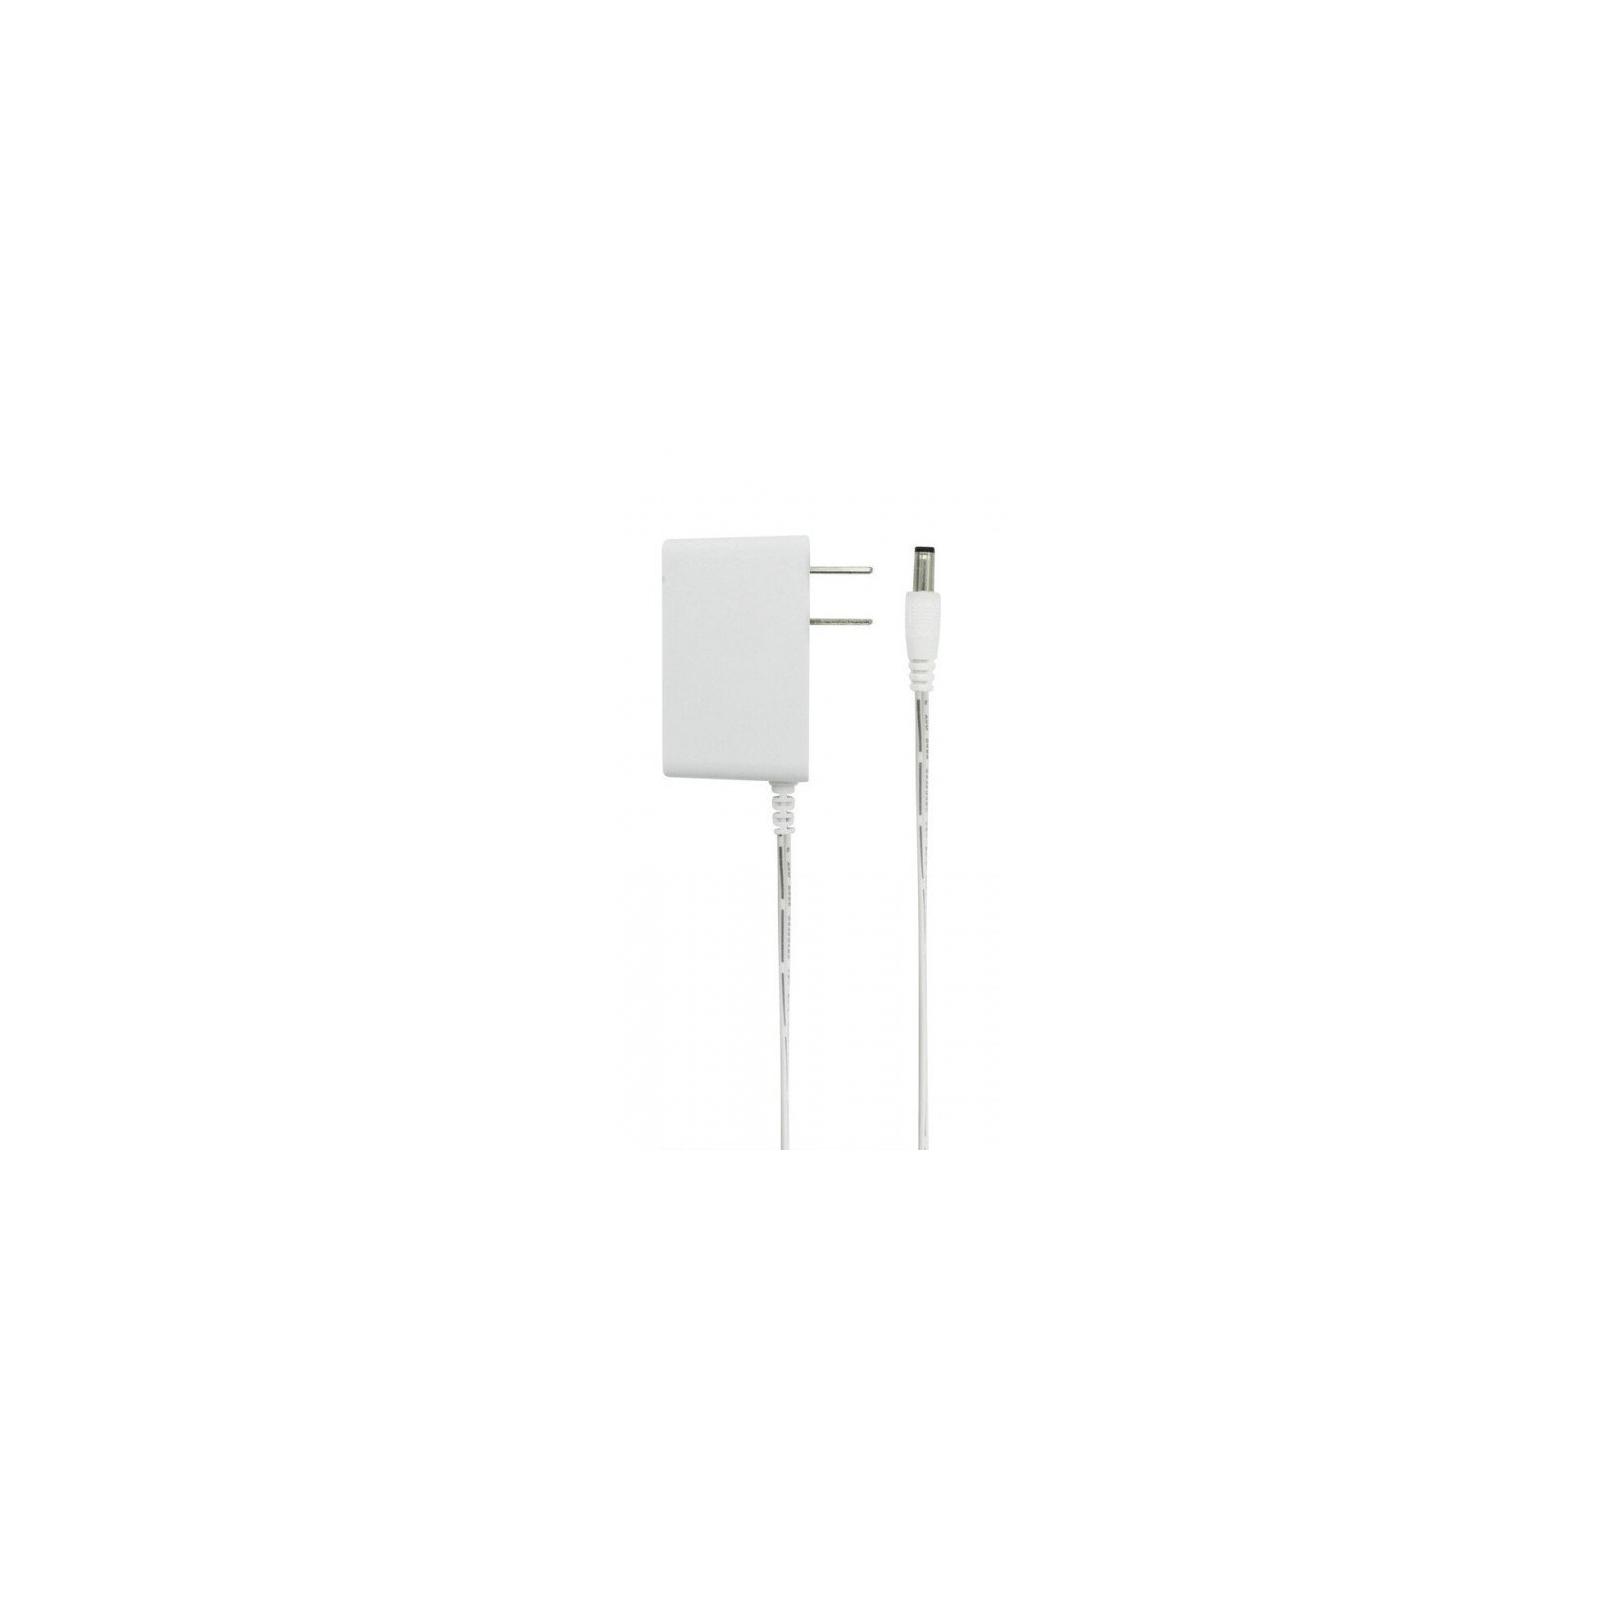 Маршрутизатор Xiaomi Mi Router 4A Giga Global зображення 6